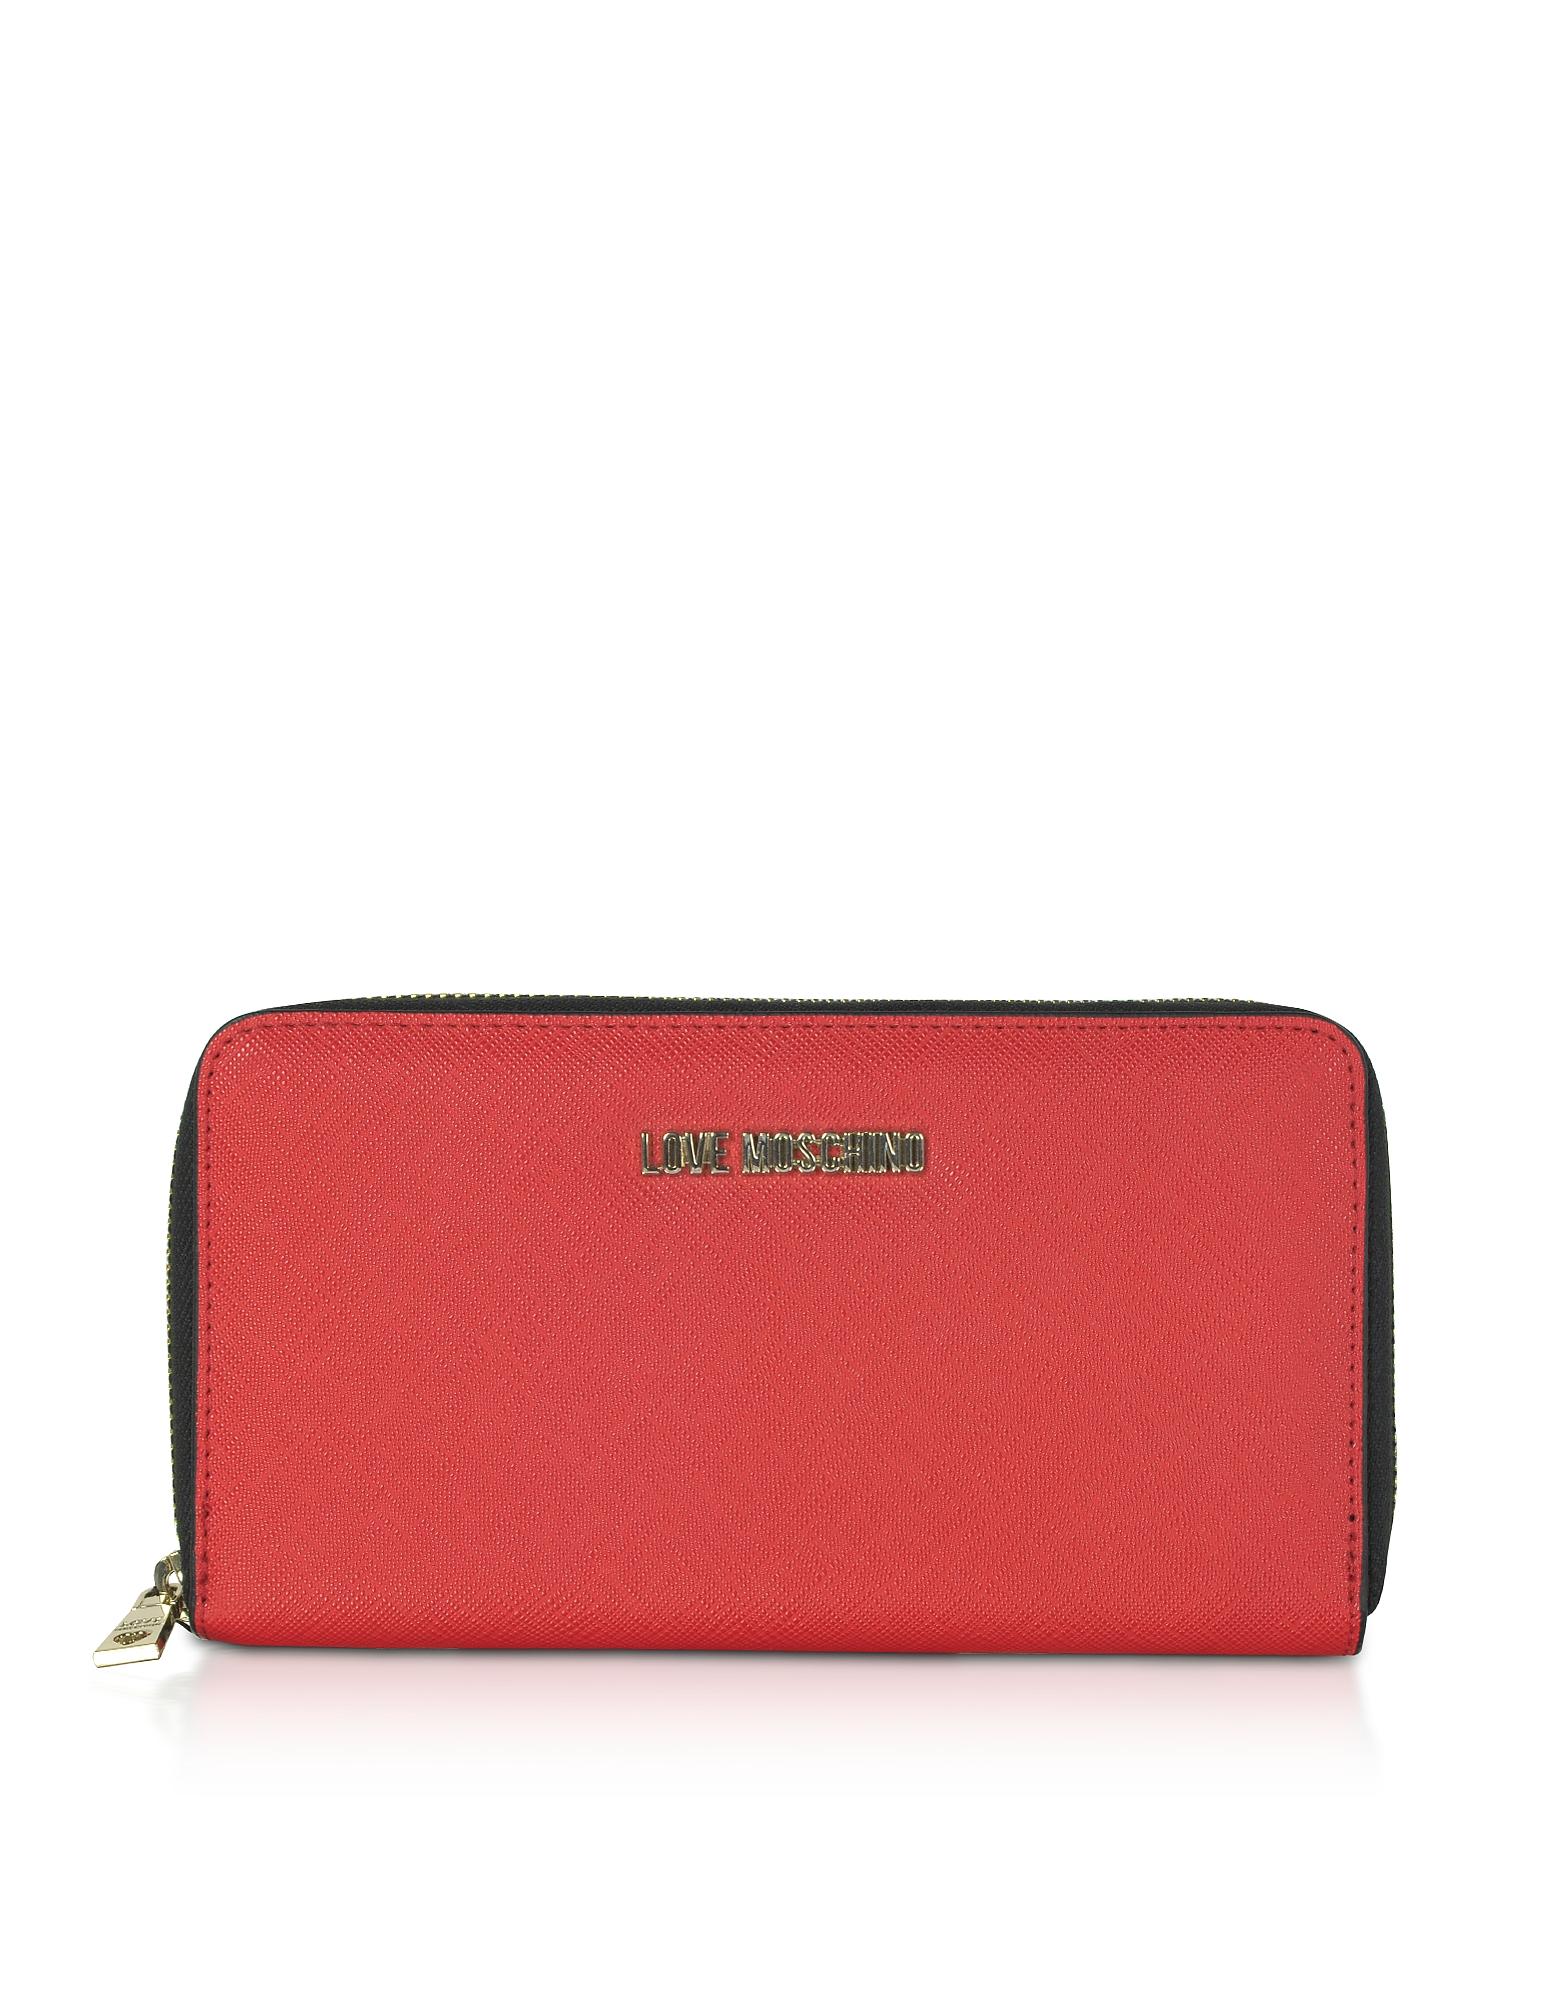 Love Moschino Designer Wallets, Red Saffiano Eco-Leather Zip-Around Women's Wallet